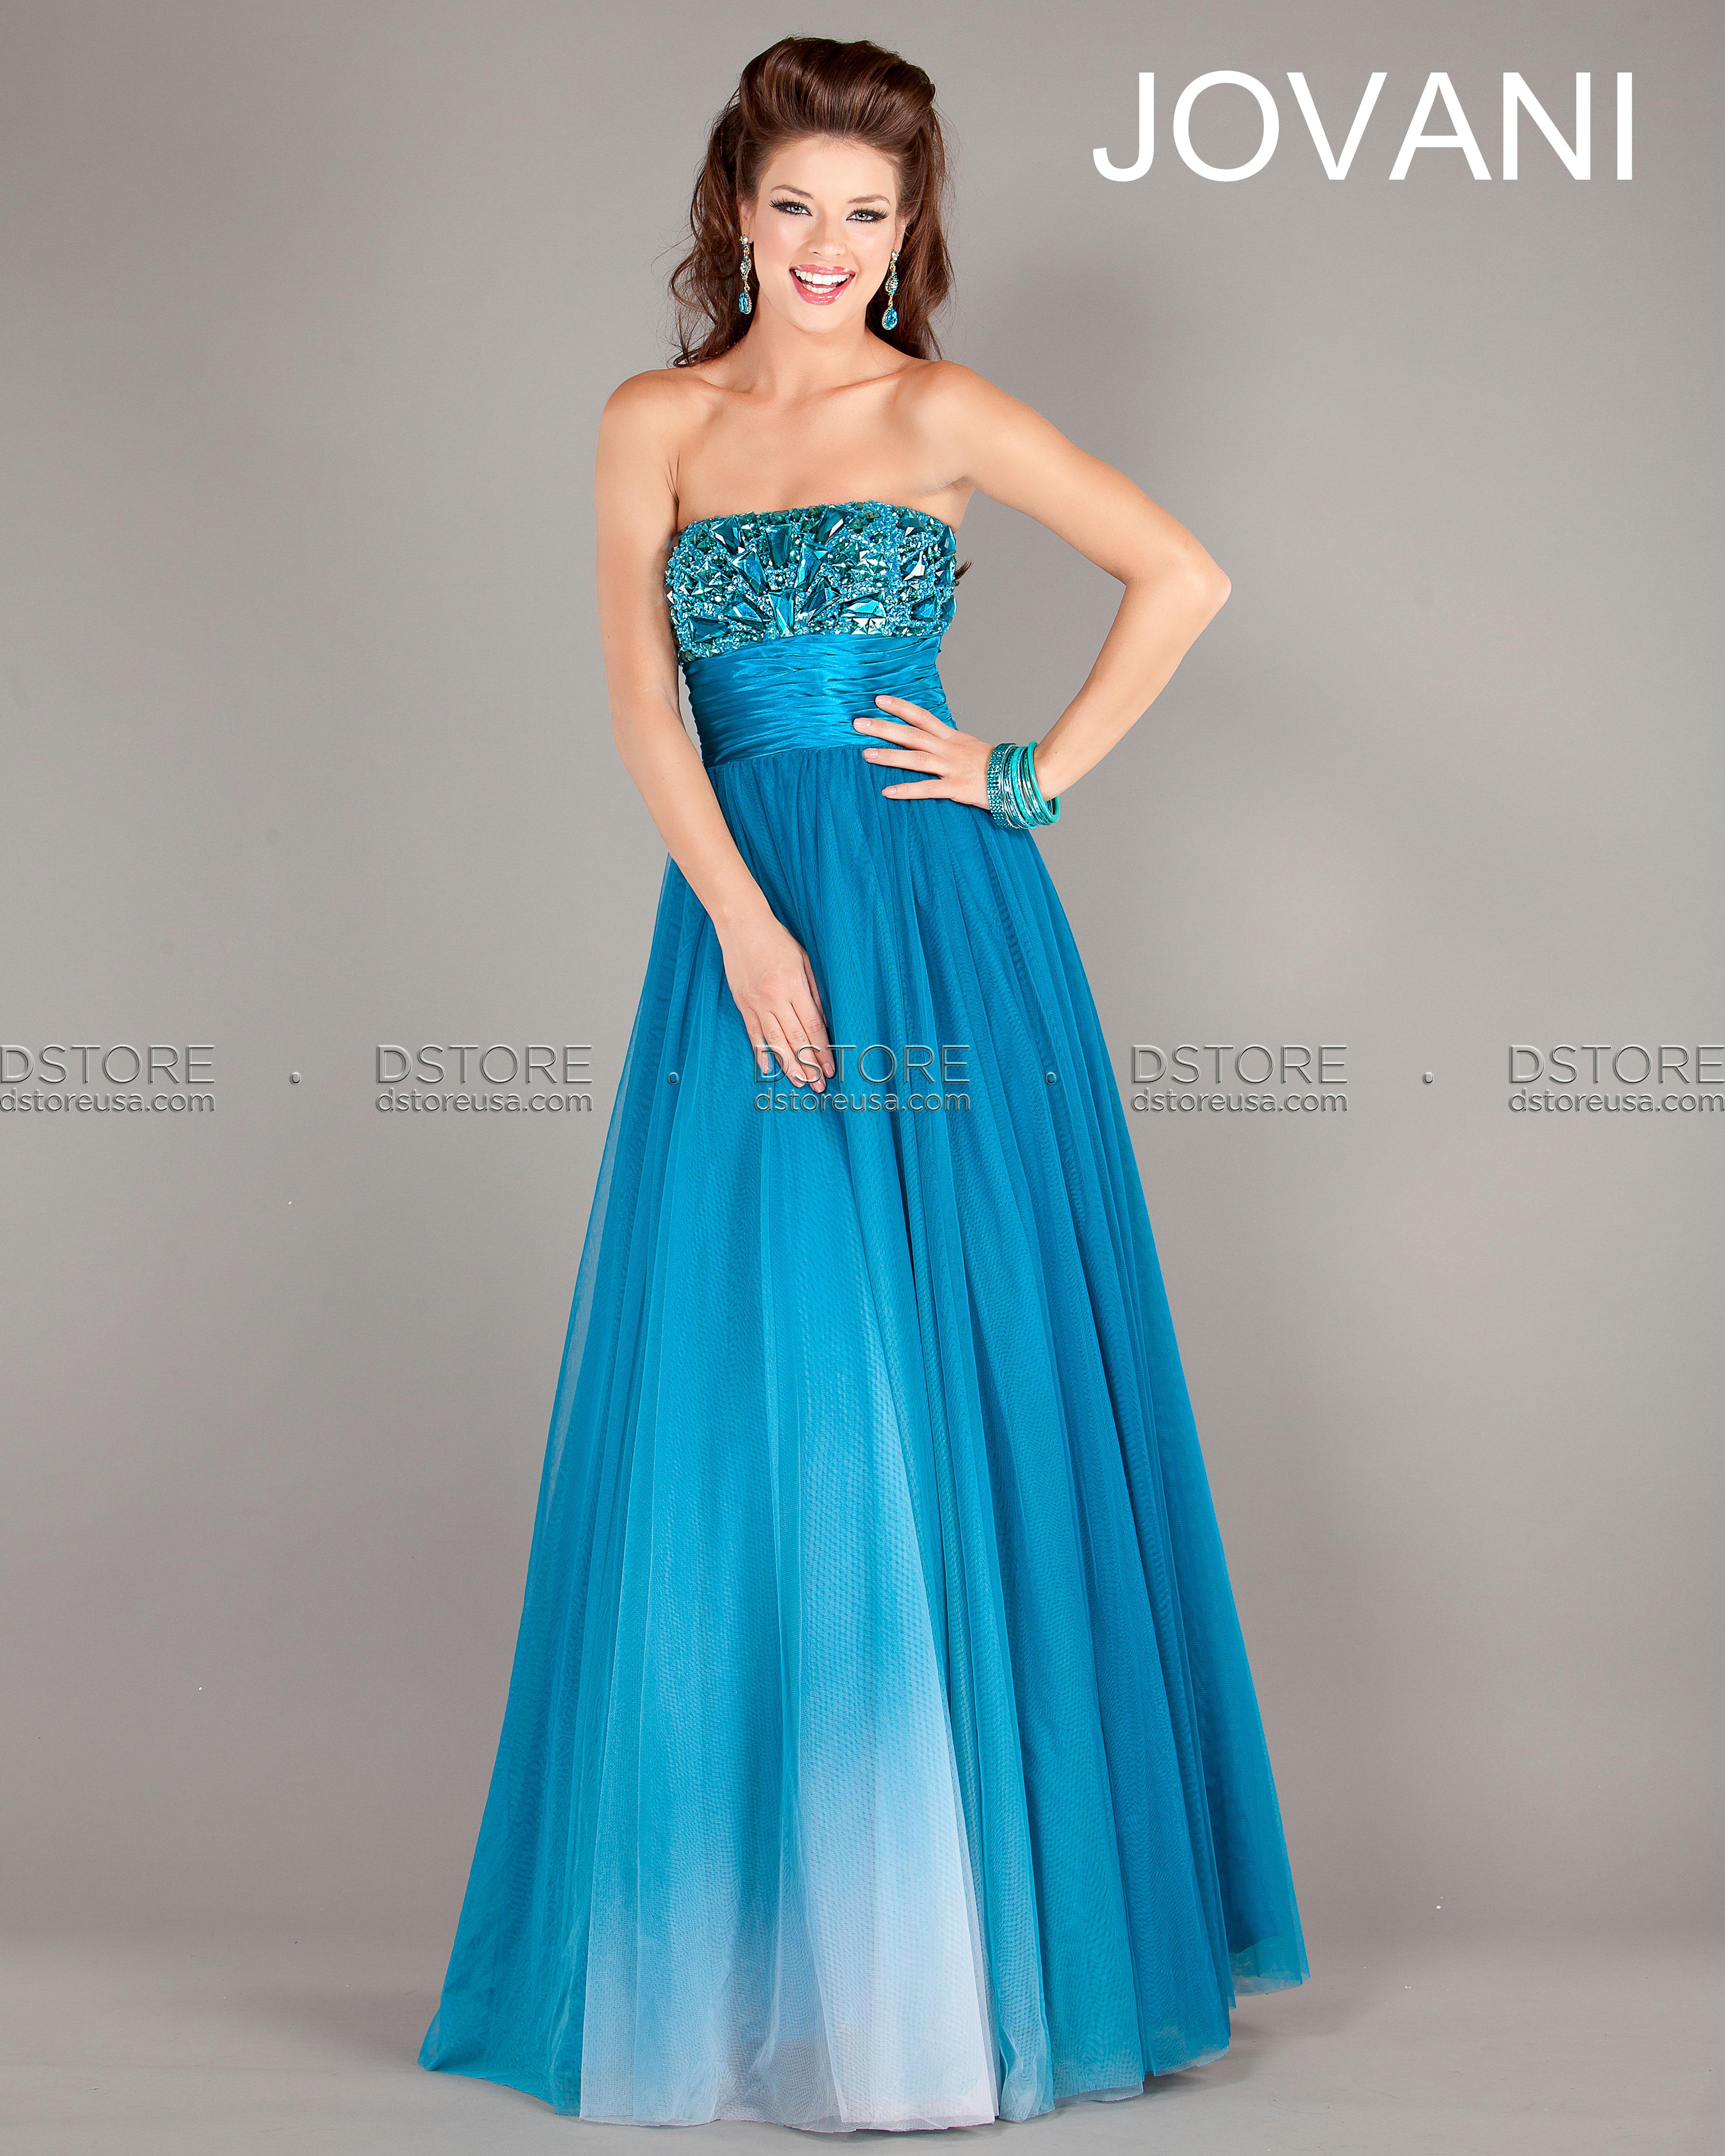 c2768ea748 Use um vestido de festa tomara que caia e fique elegante - Moda e ...